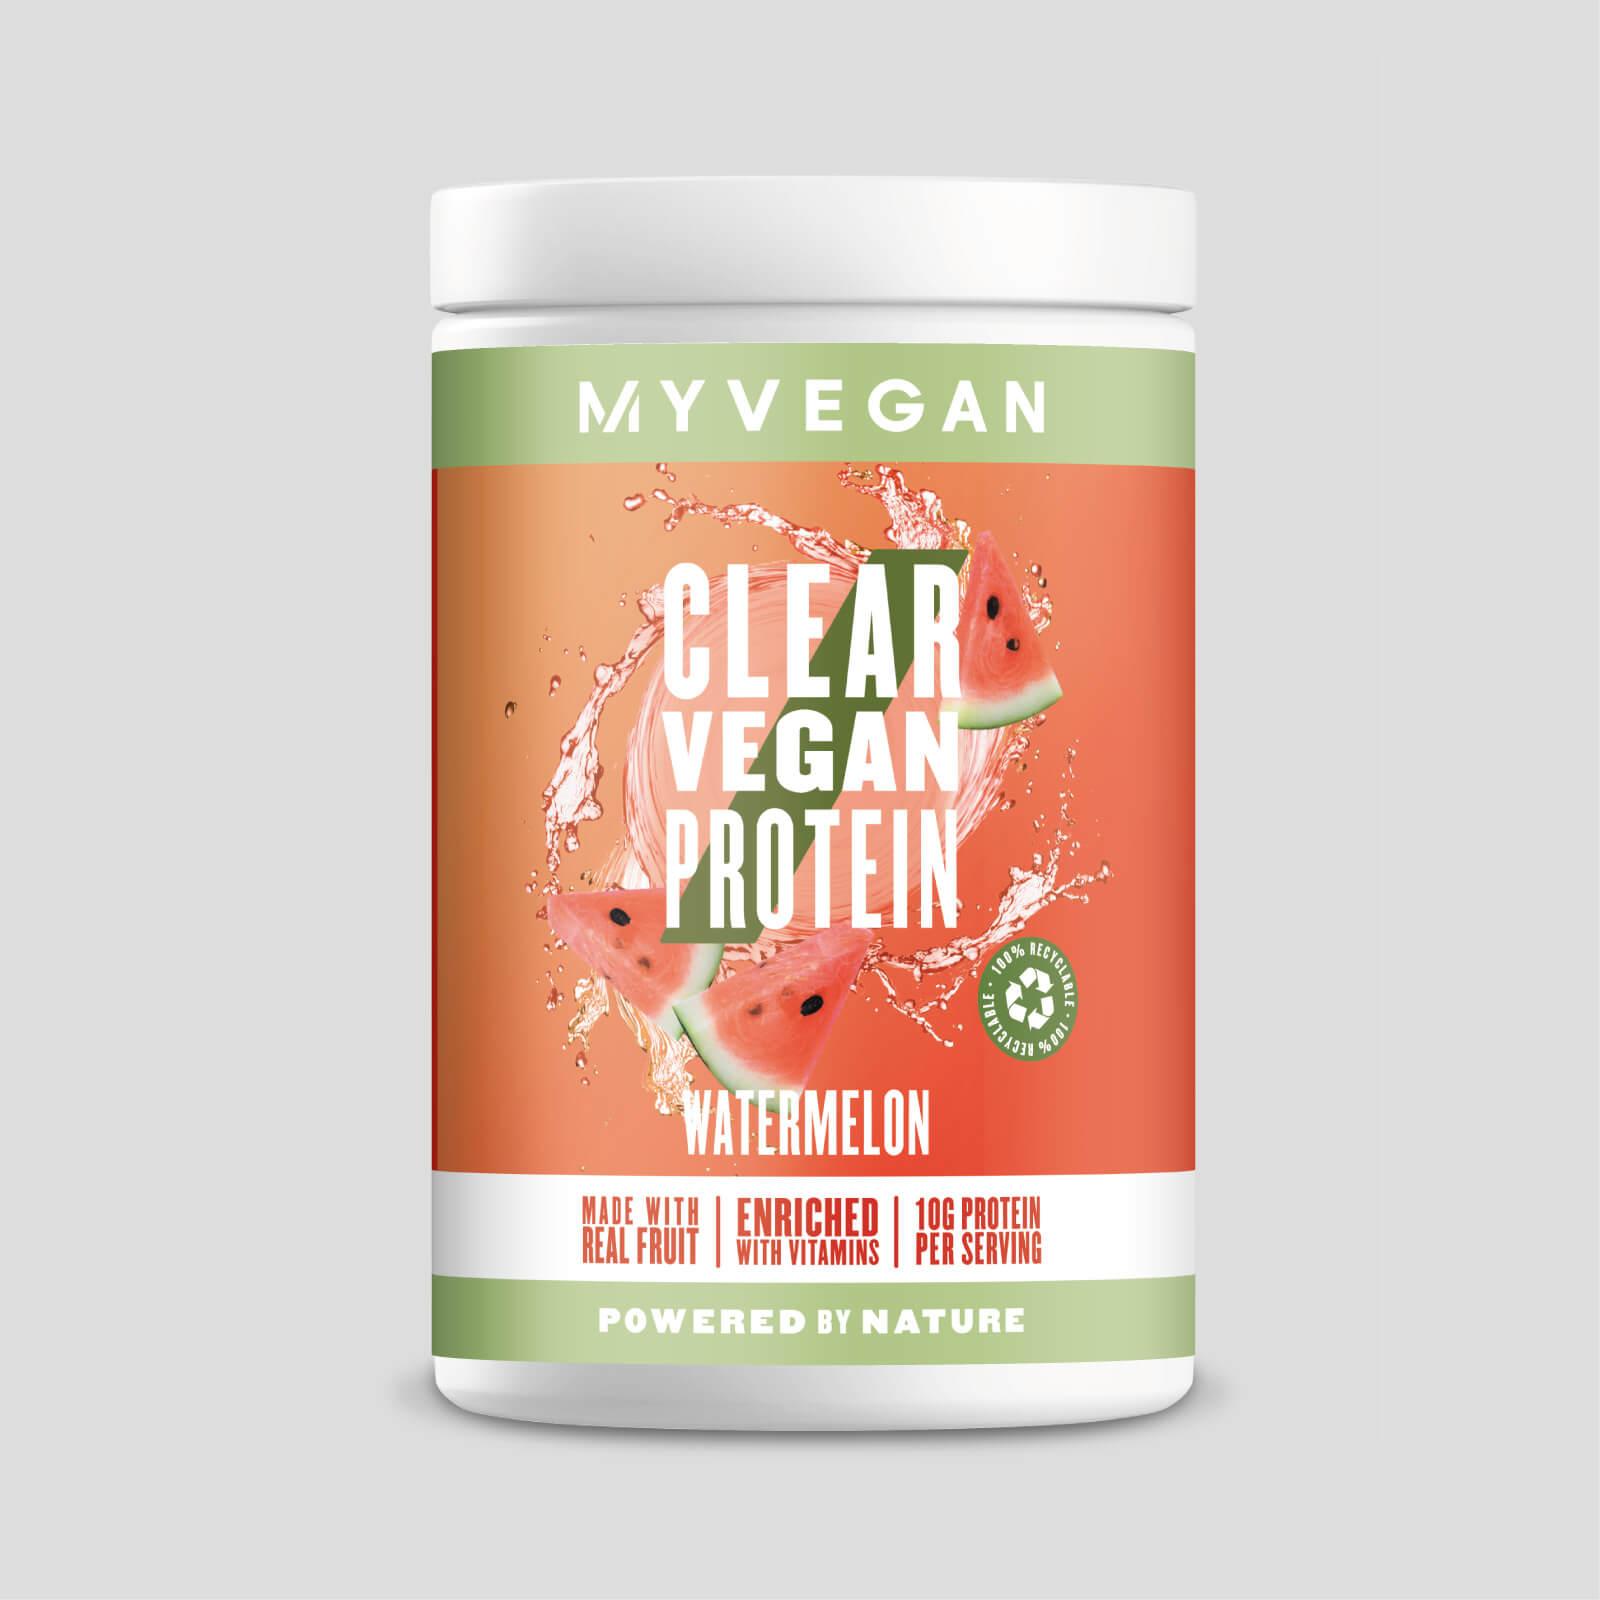 Myvegan Clear Vegan Protein - 20servings - Pastèque